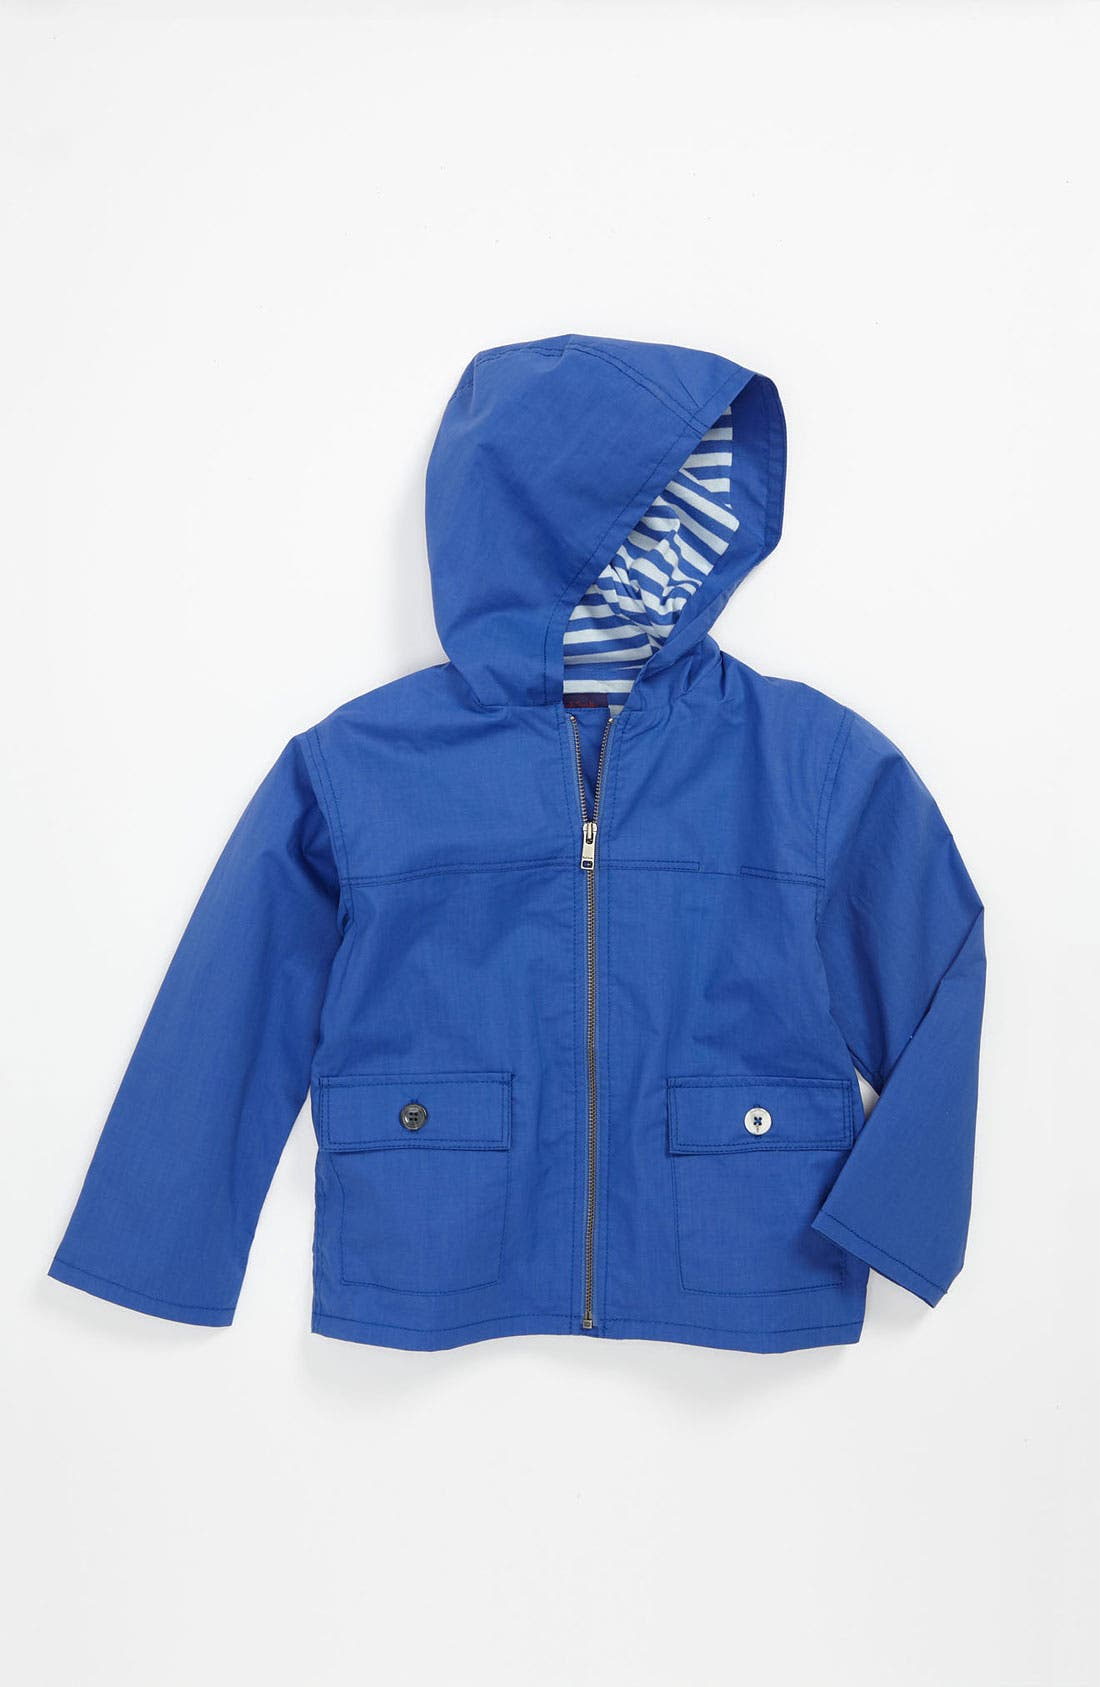 Main Image - Paul Smith Junior Jacket (Toddler)